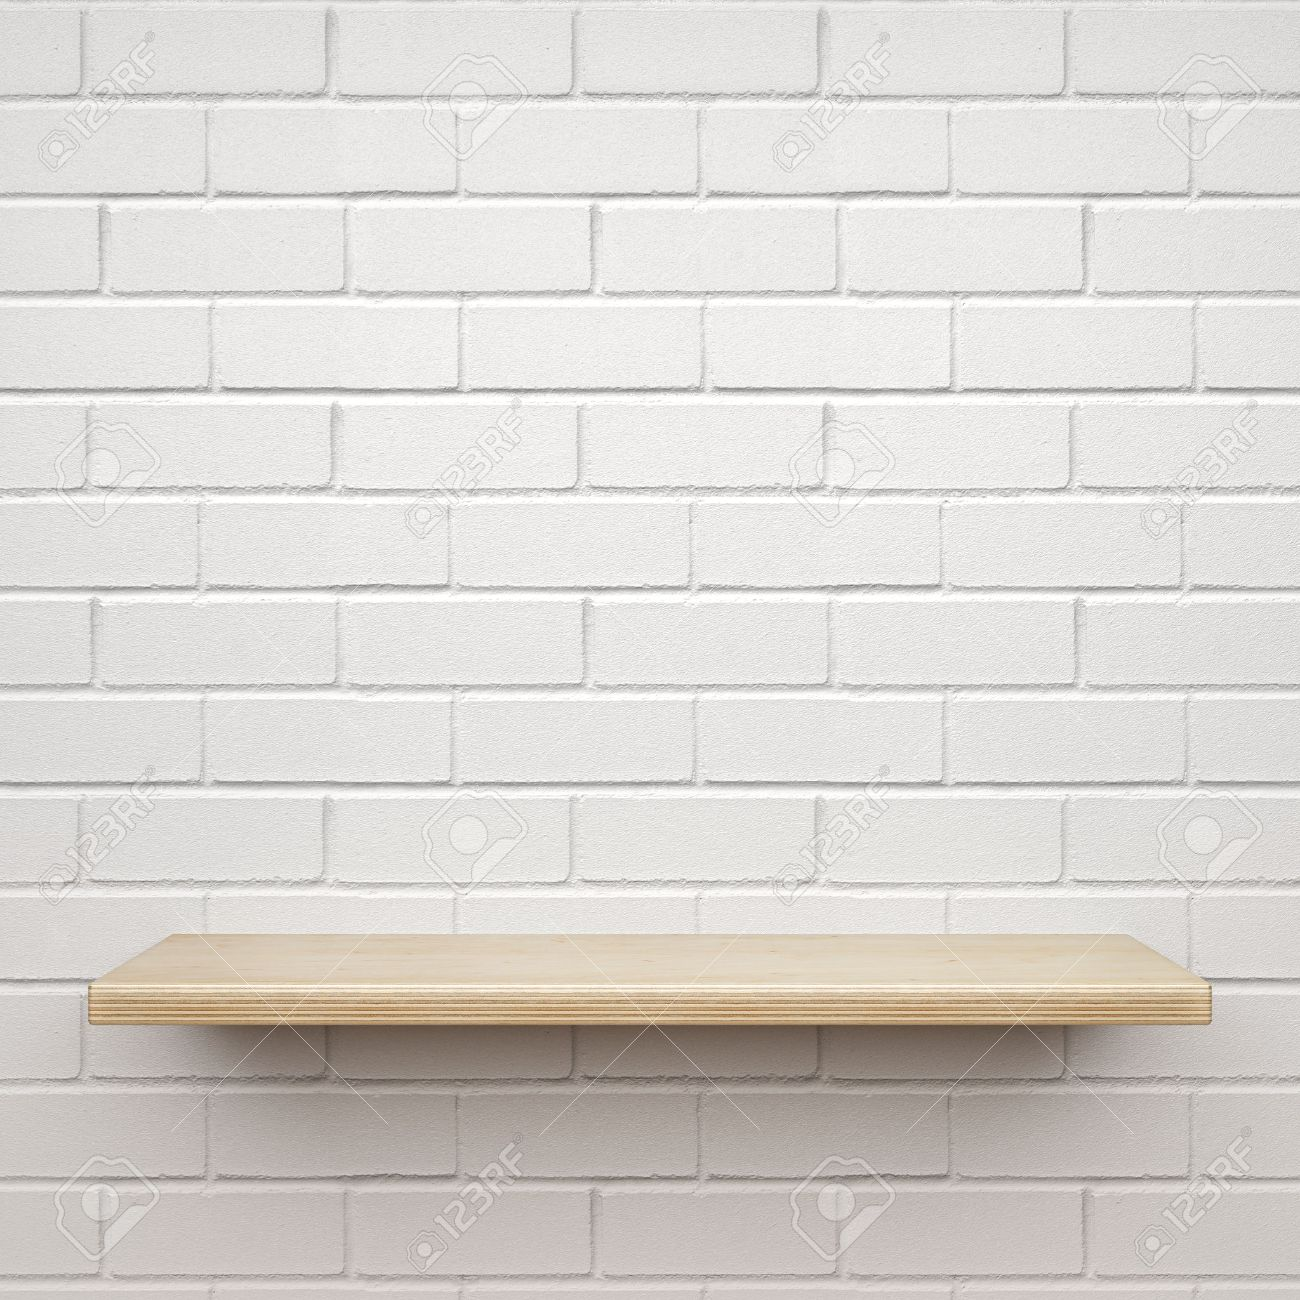 Empty wooden shelf on white brick wall Stock Photo - 53616423